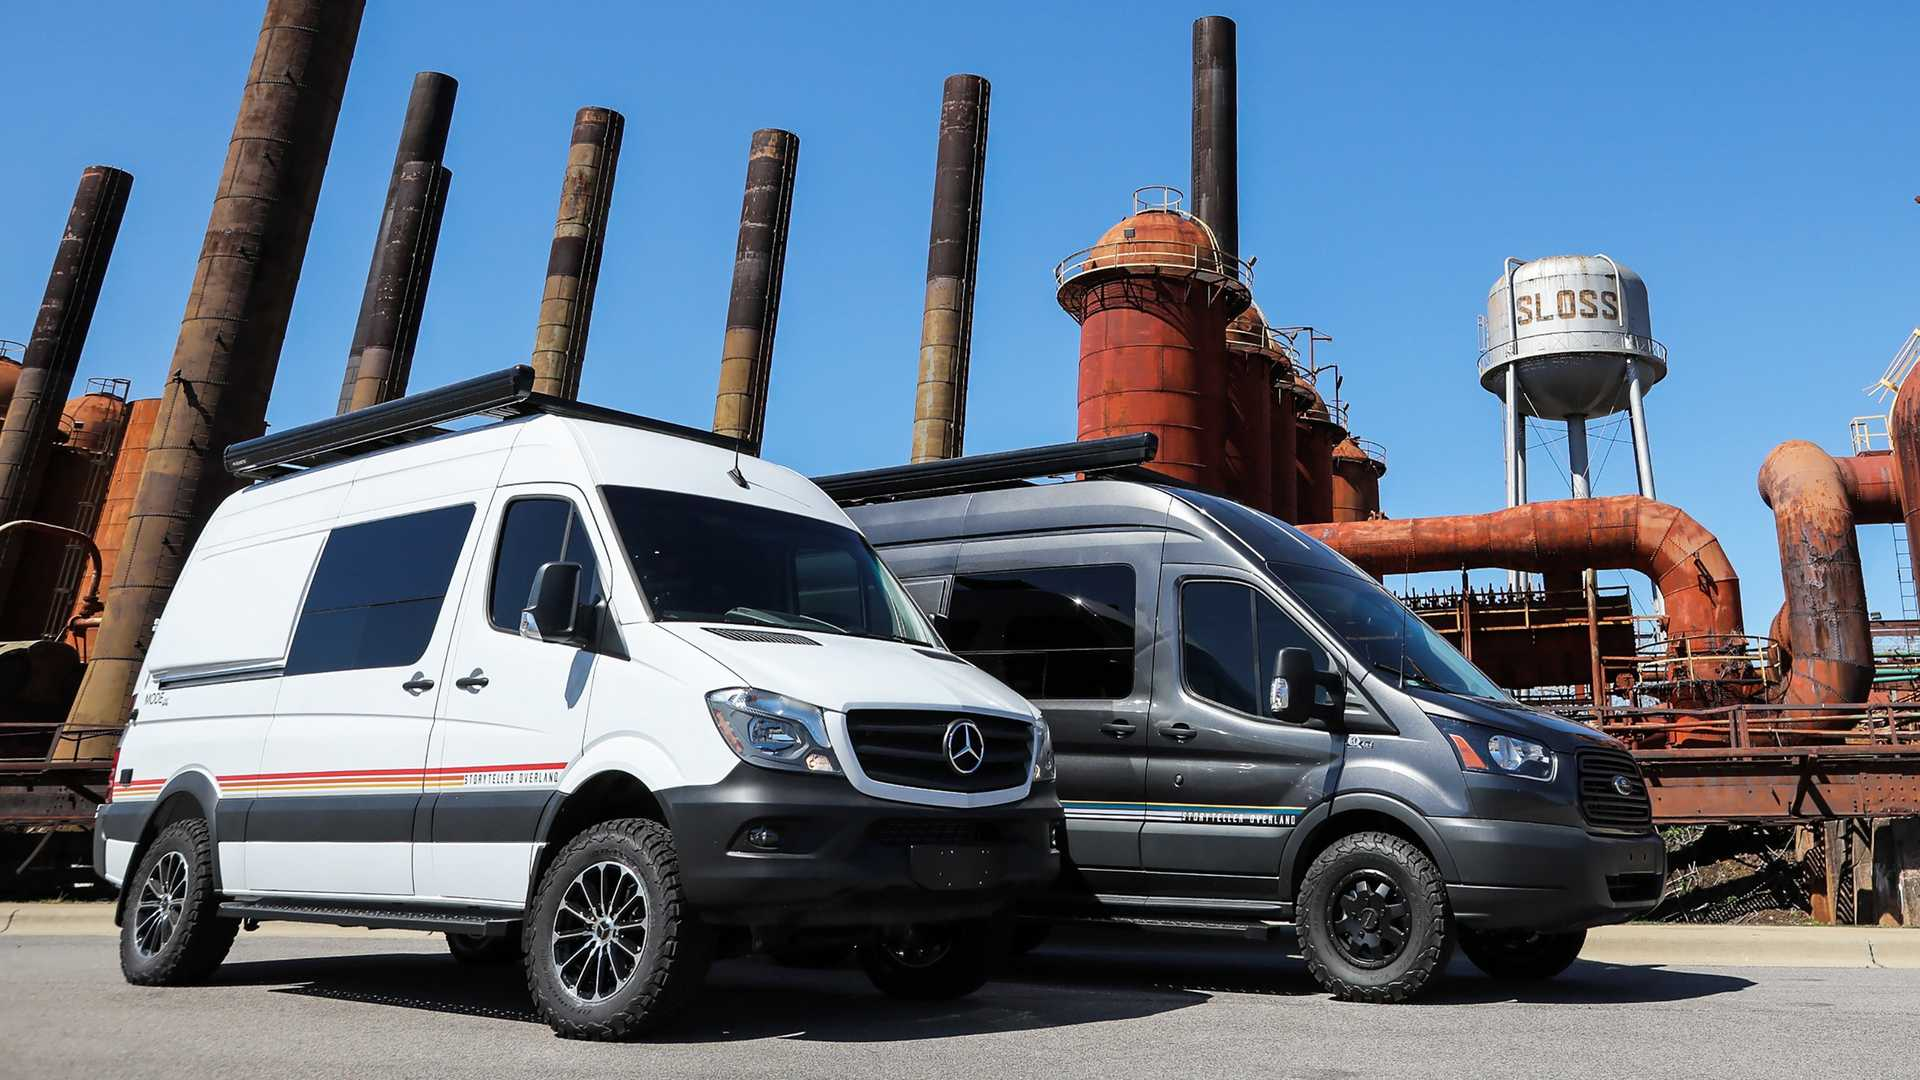 Storyteller Overland Mode 4x4 Camper Vans Are Adventure Ready